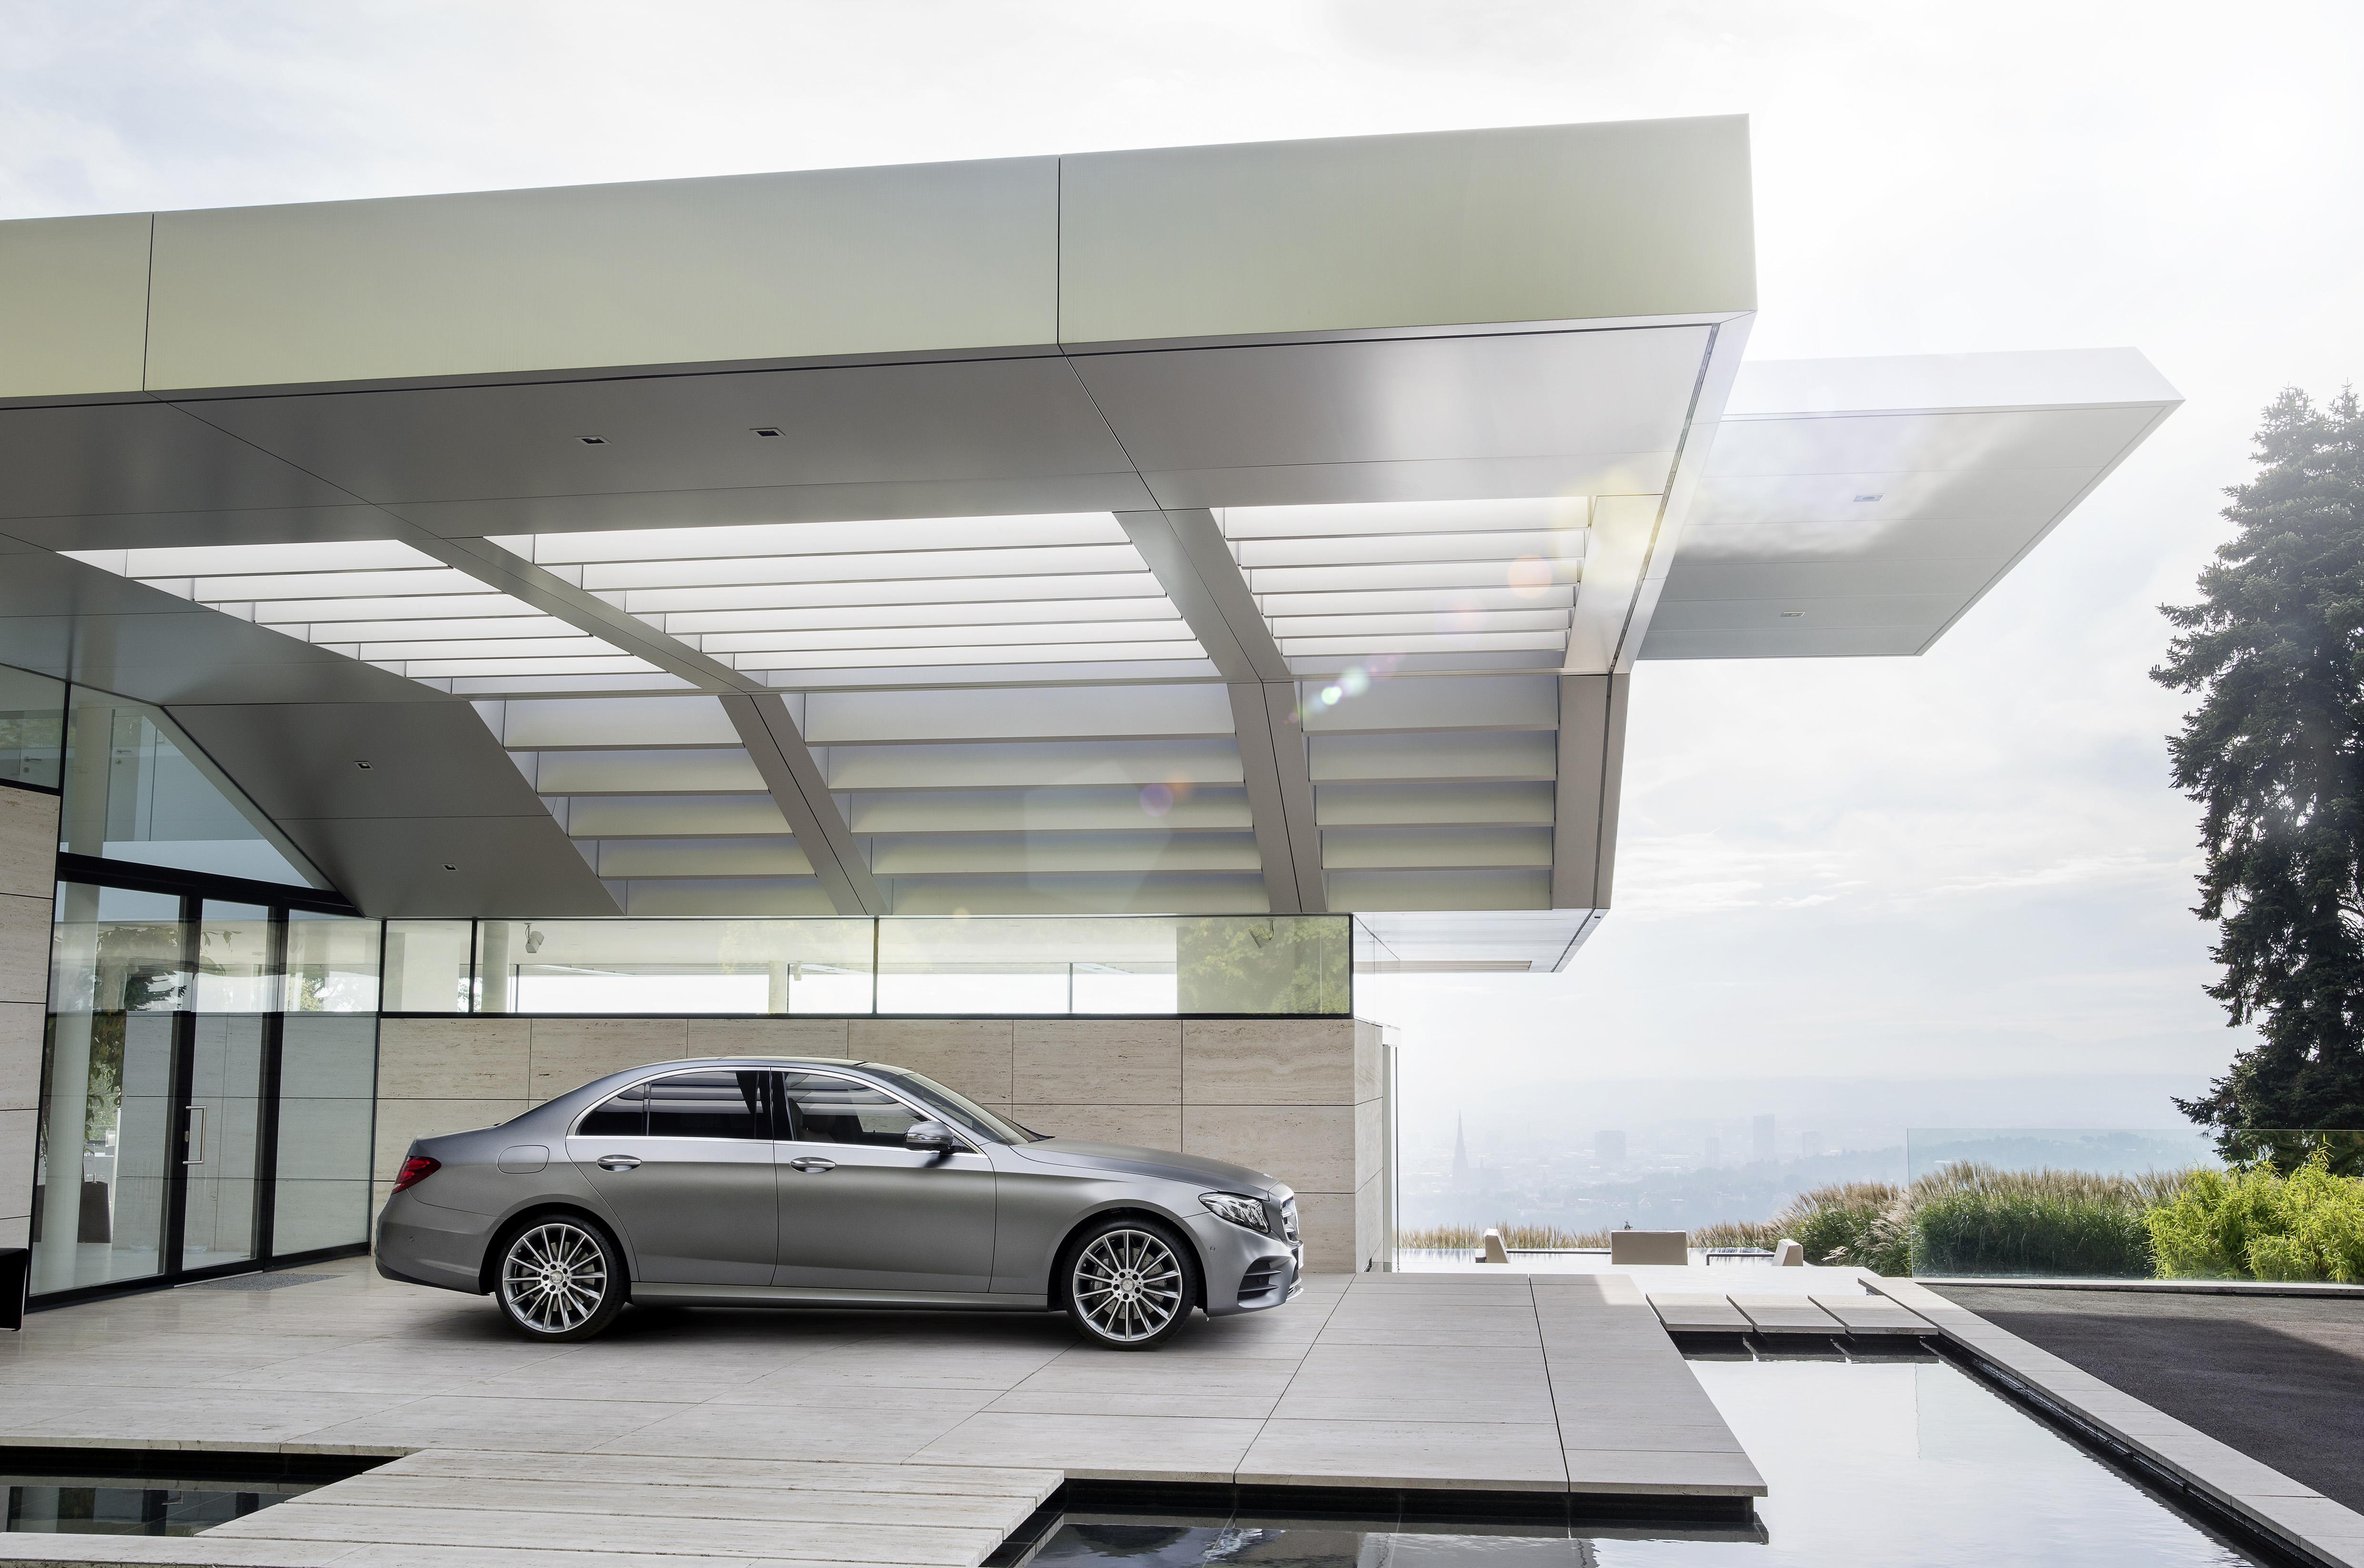 Mercedes Unveils Its 2017 E Class 350e Plug In Hybrid With 18 Miles Benz Cl 400 4matic Amg Line Selenitgrau Magno Leder Schwarz Sattelbraun Selenit Grey Leather Black Saddle Brown